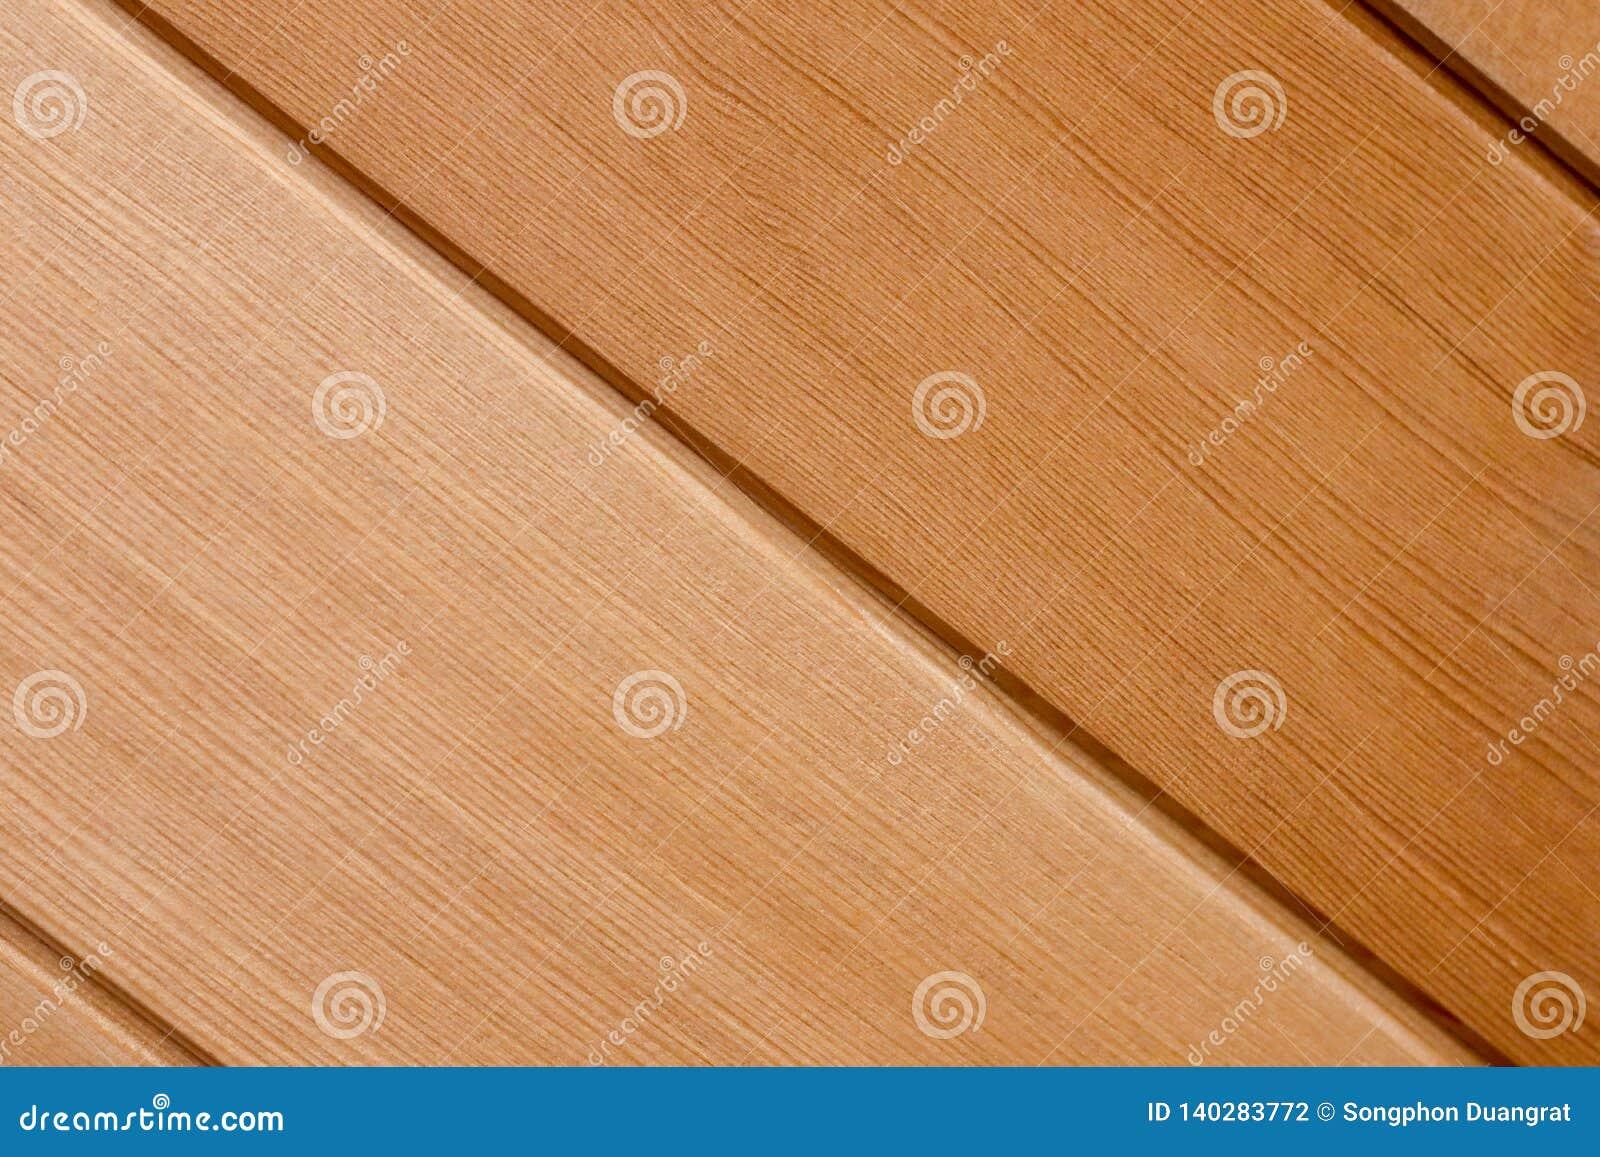 Wood oblique patterns texture background